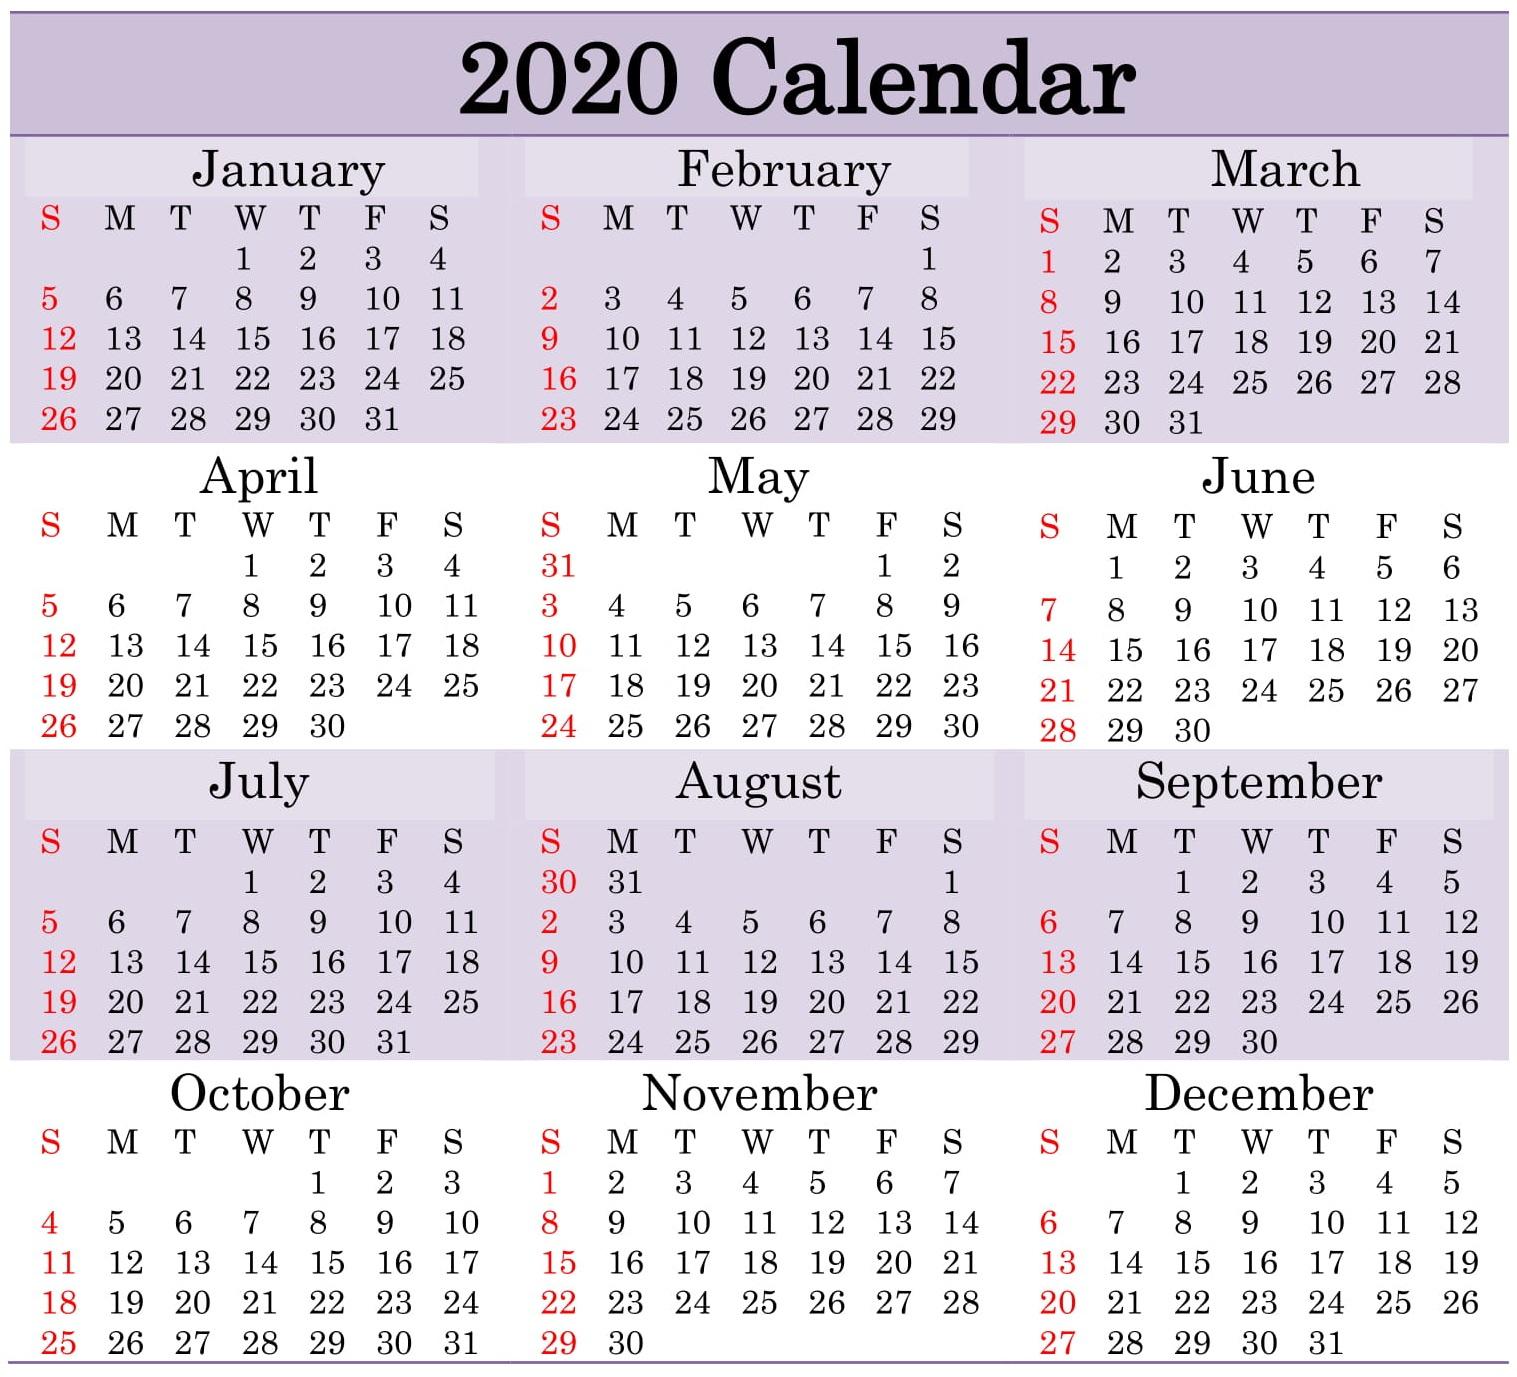 Printable 2020 Calendar Word Document  Latest Printable with regard to Printable 2007 Calendar